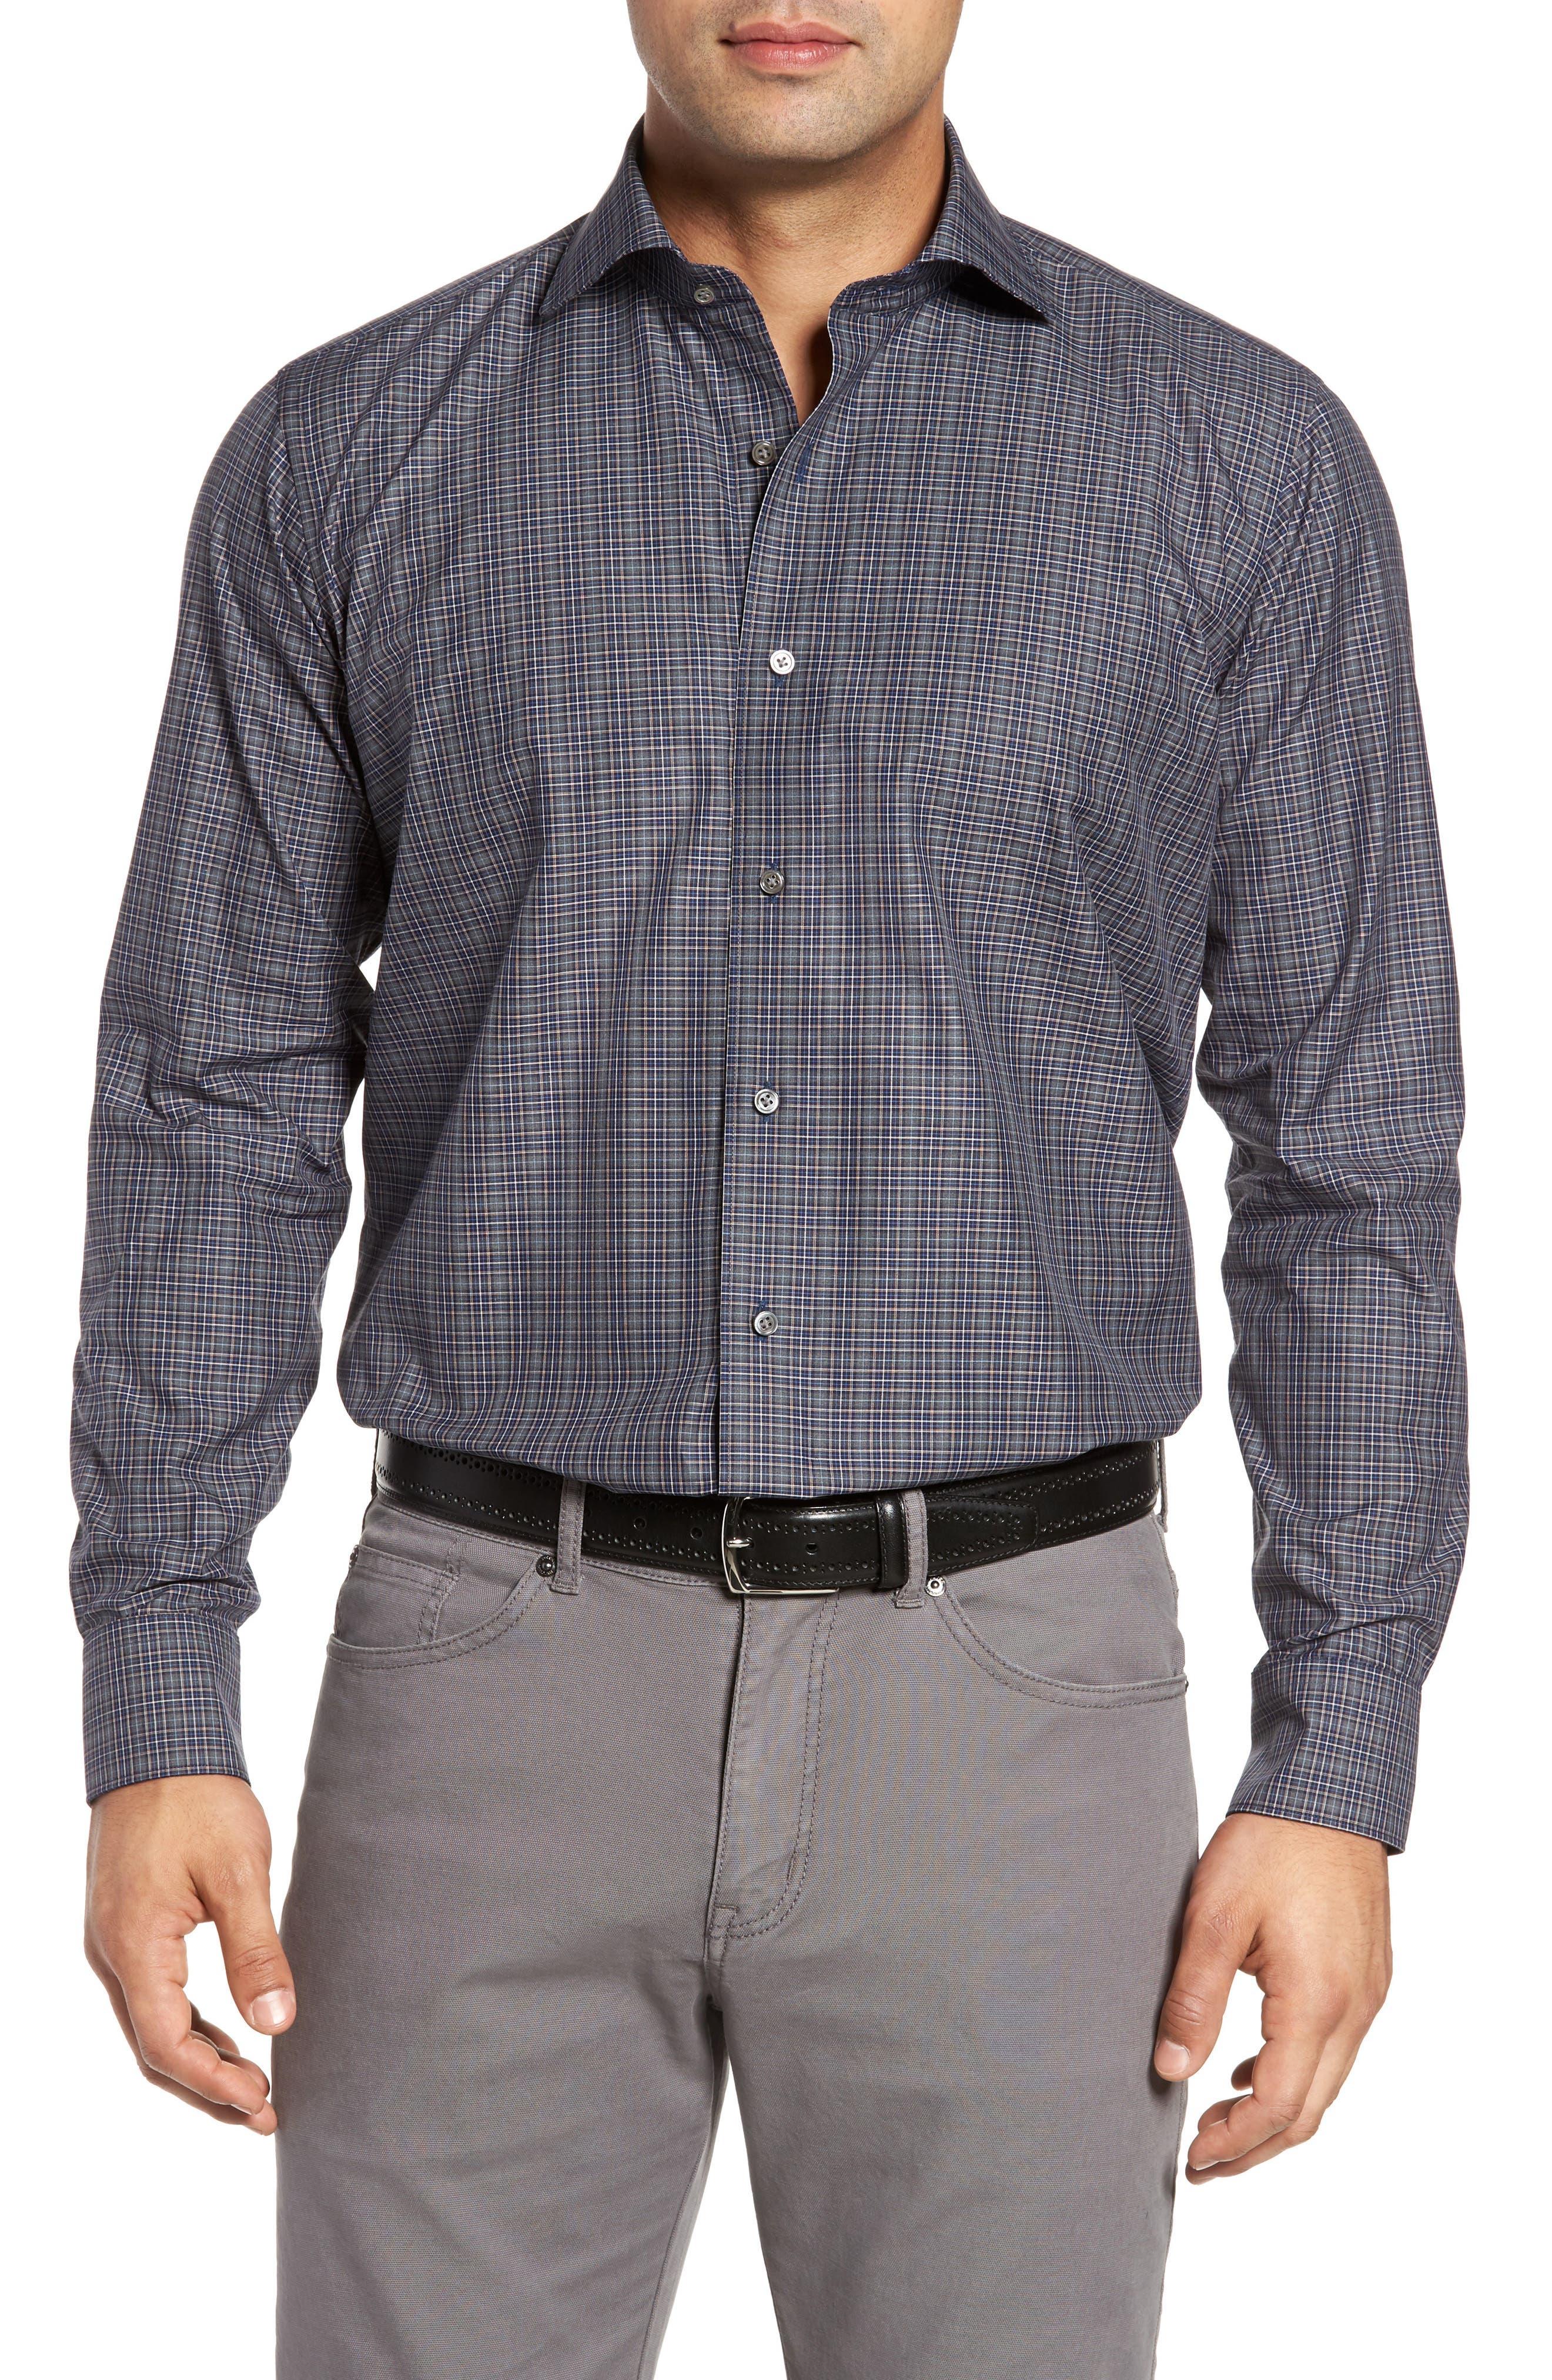 Alternate Image 1 Selected - Peter Millar Collection Meadows Mélange Regular Fit Check Sport Shirt